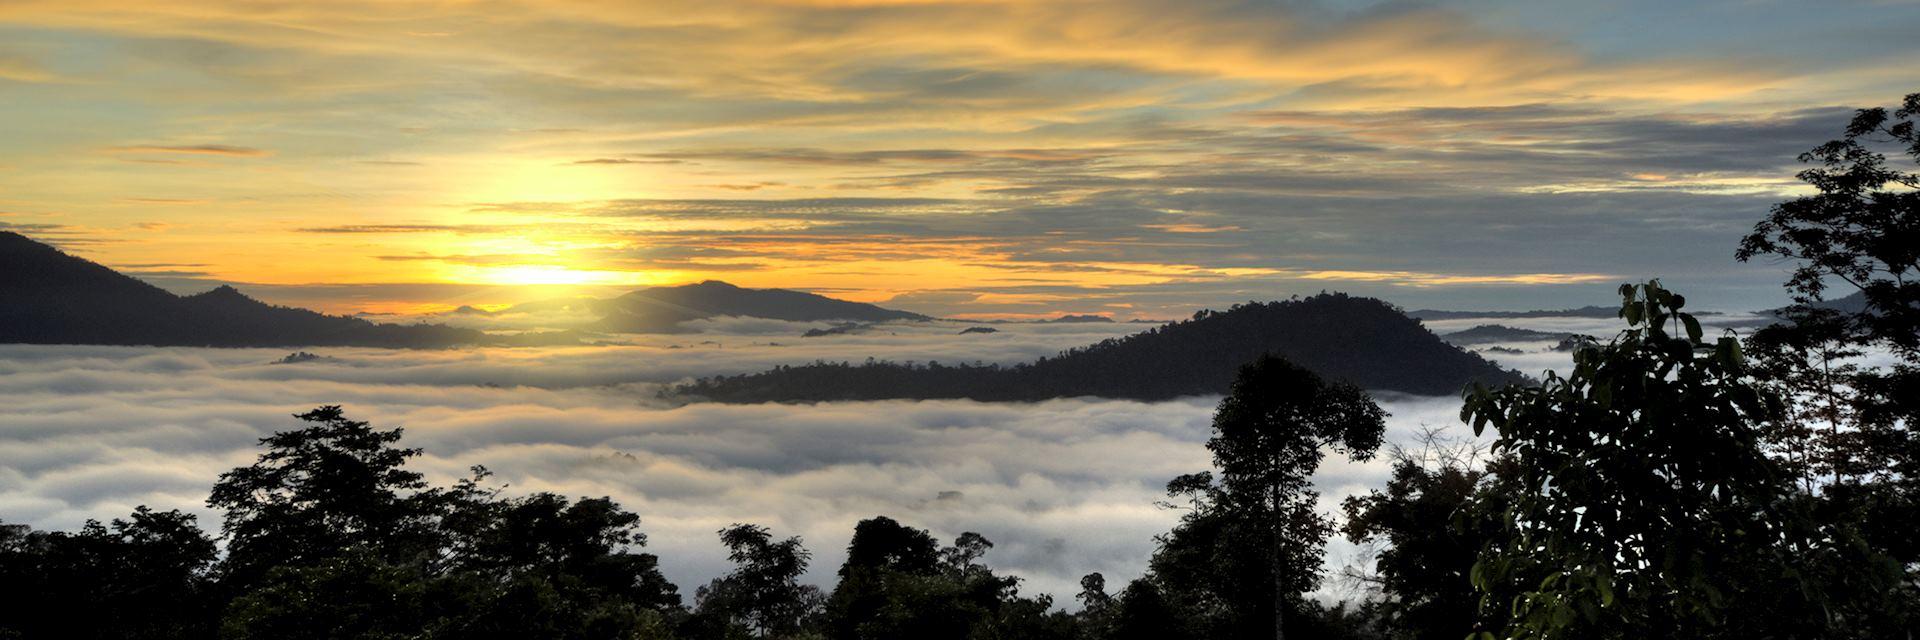 Danum Valley, sunset, Island of Borneo